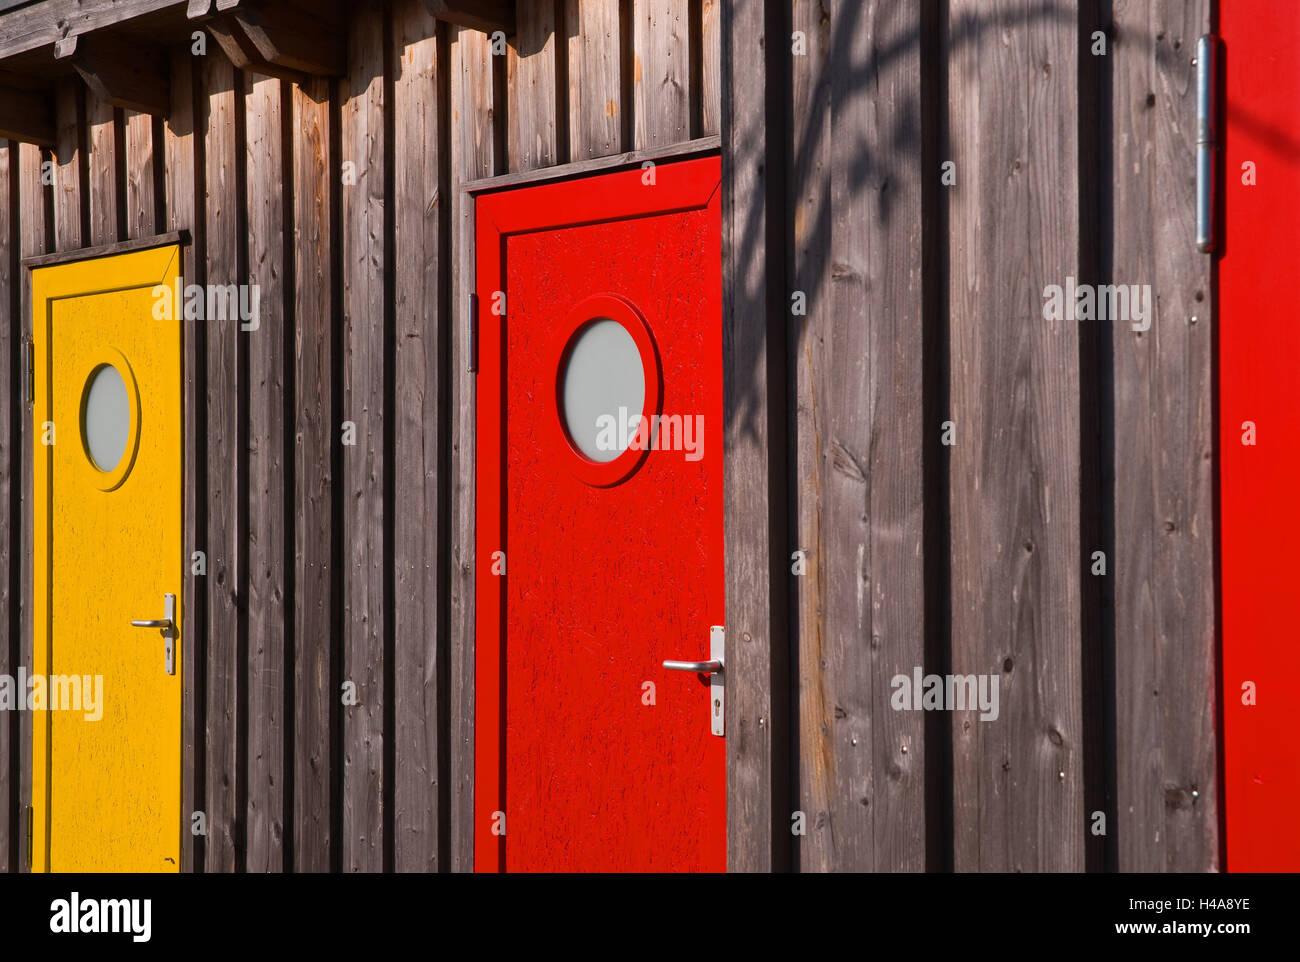 wooden steelworks, coloured doors, - Stock Image